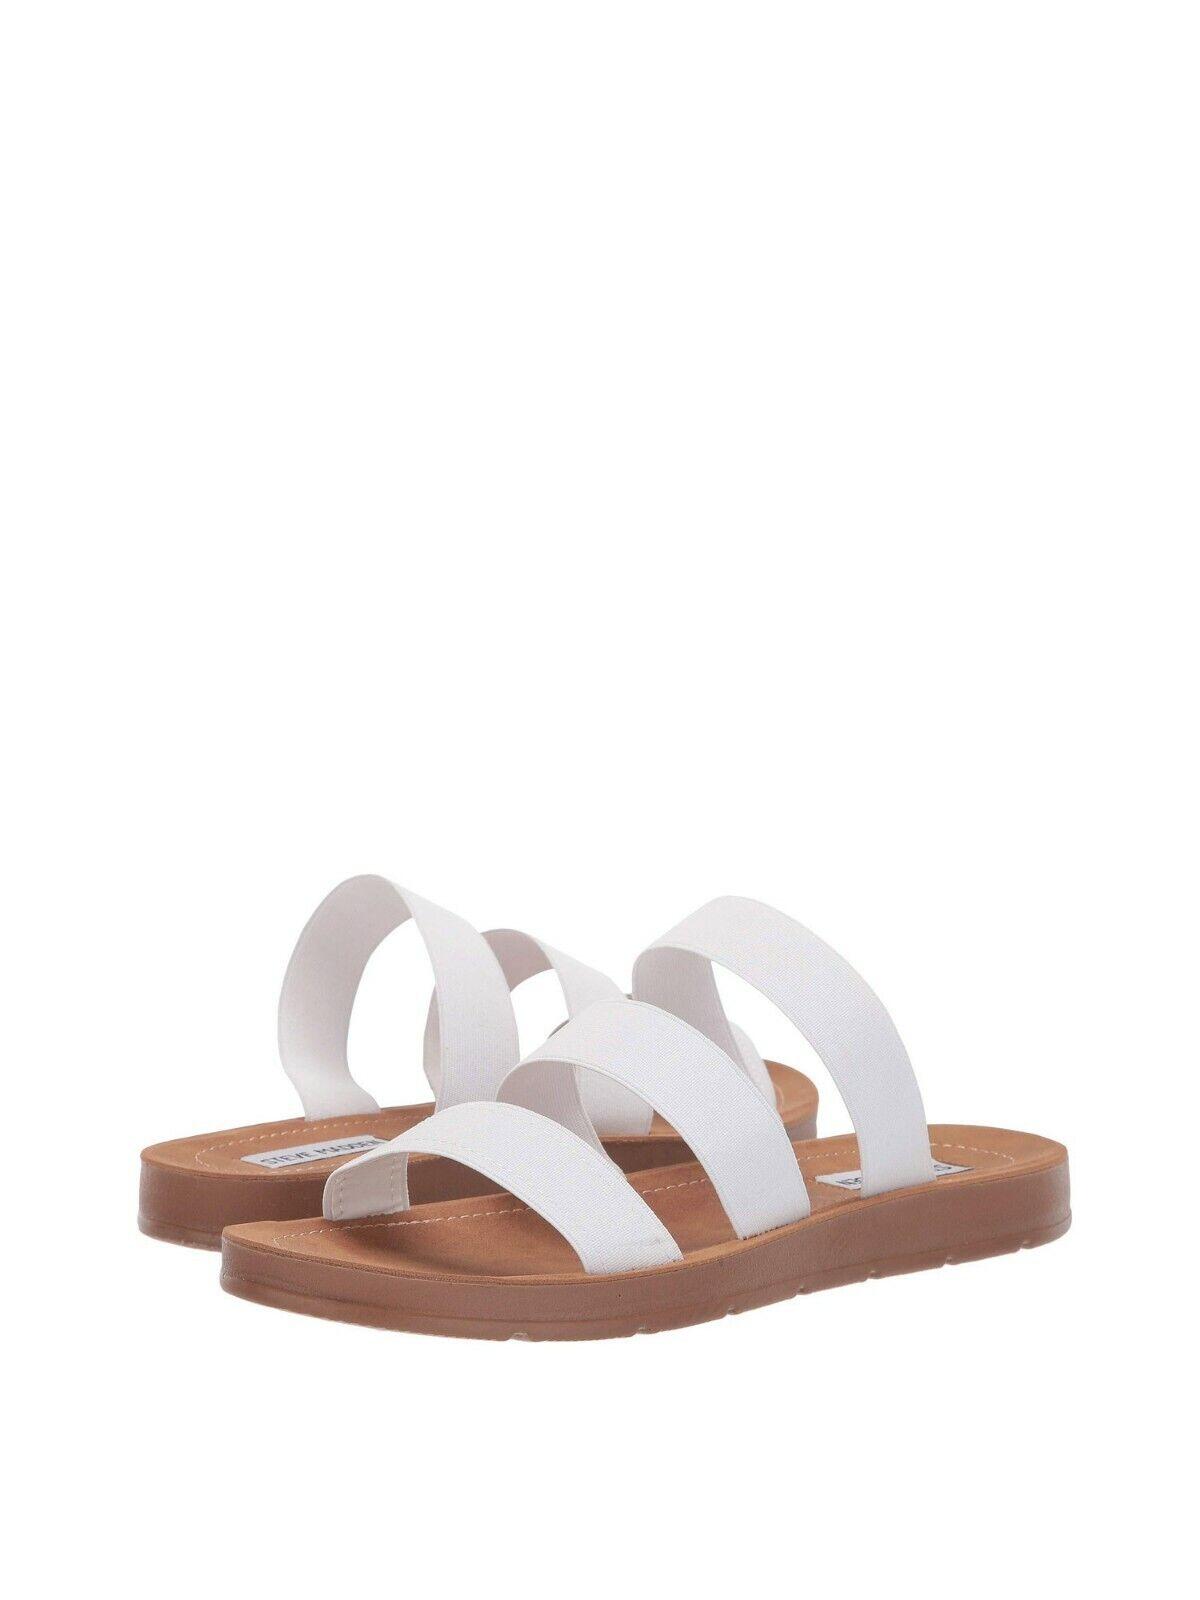 Women's shoes Steve Madden PASCALE Casual Elastic Slide Sandals WHITE